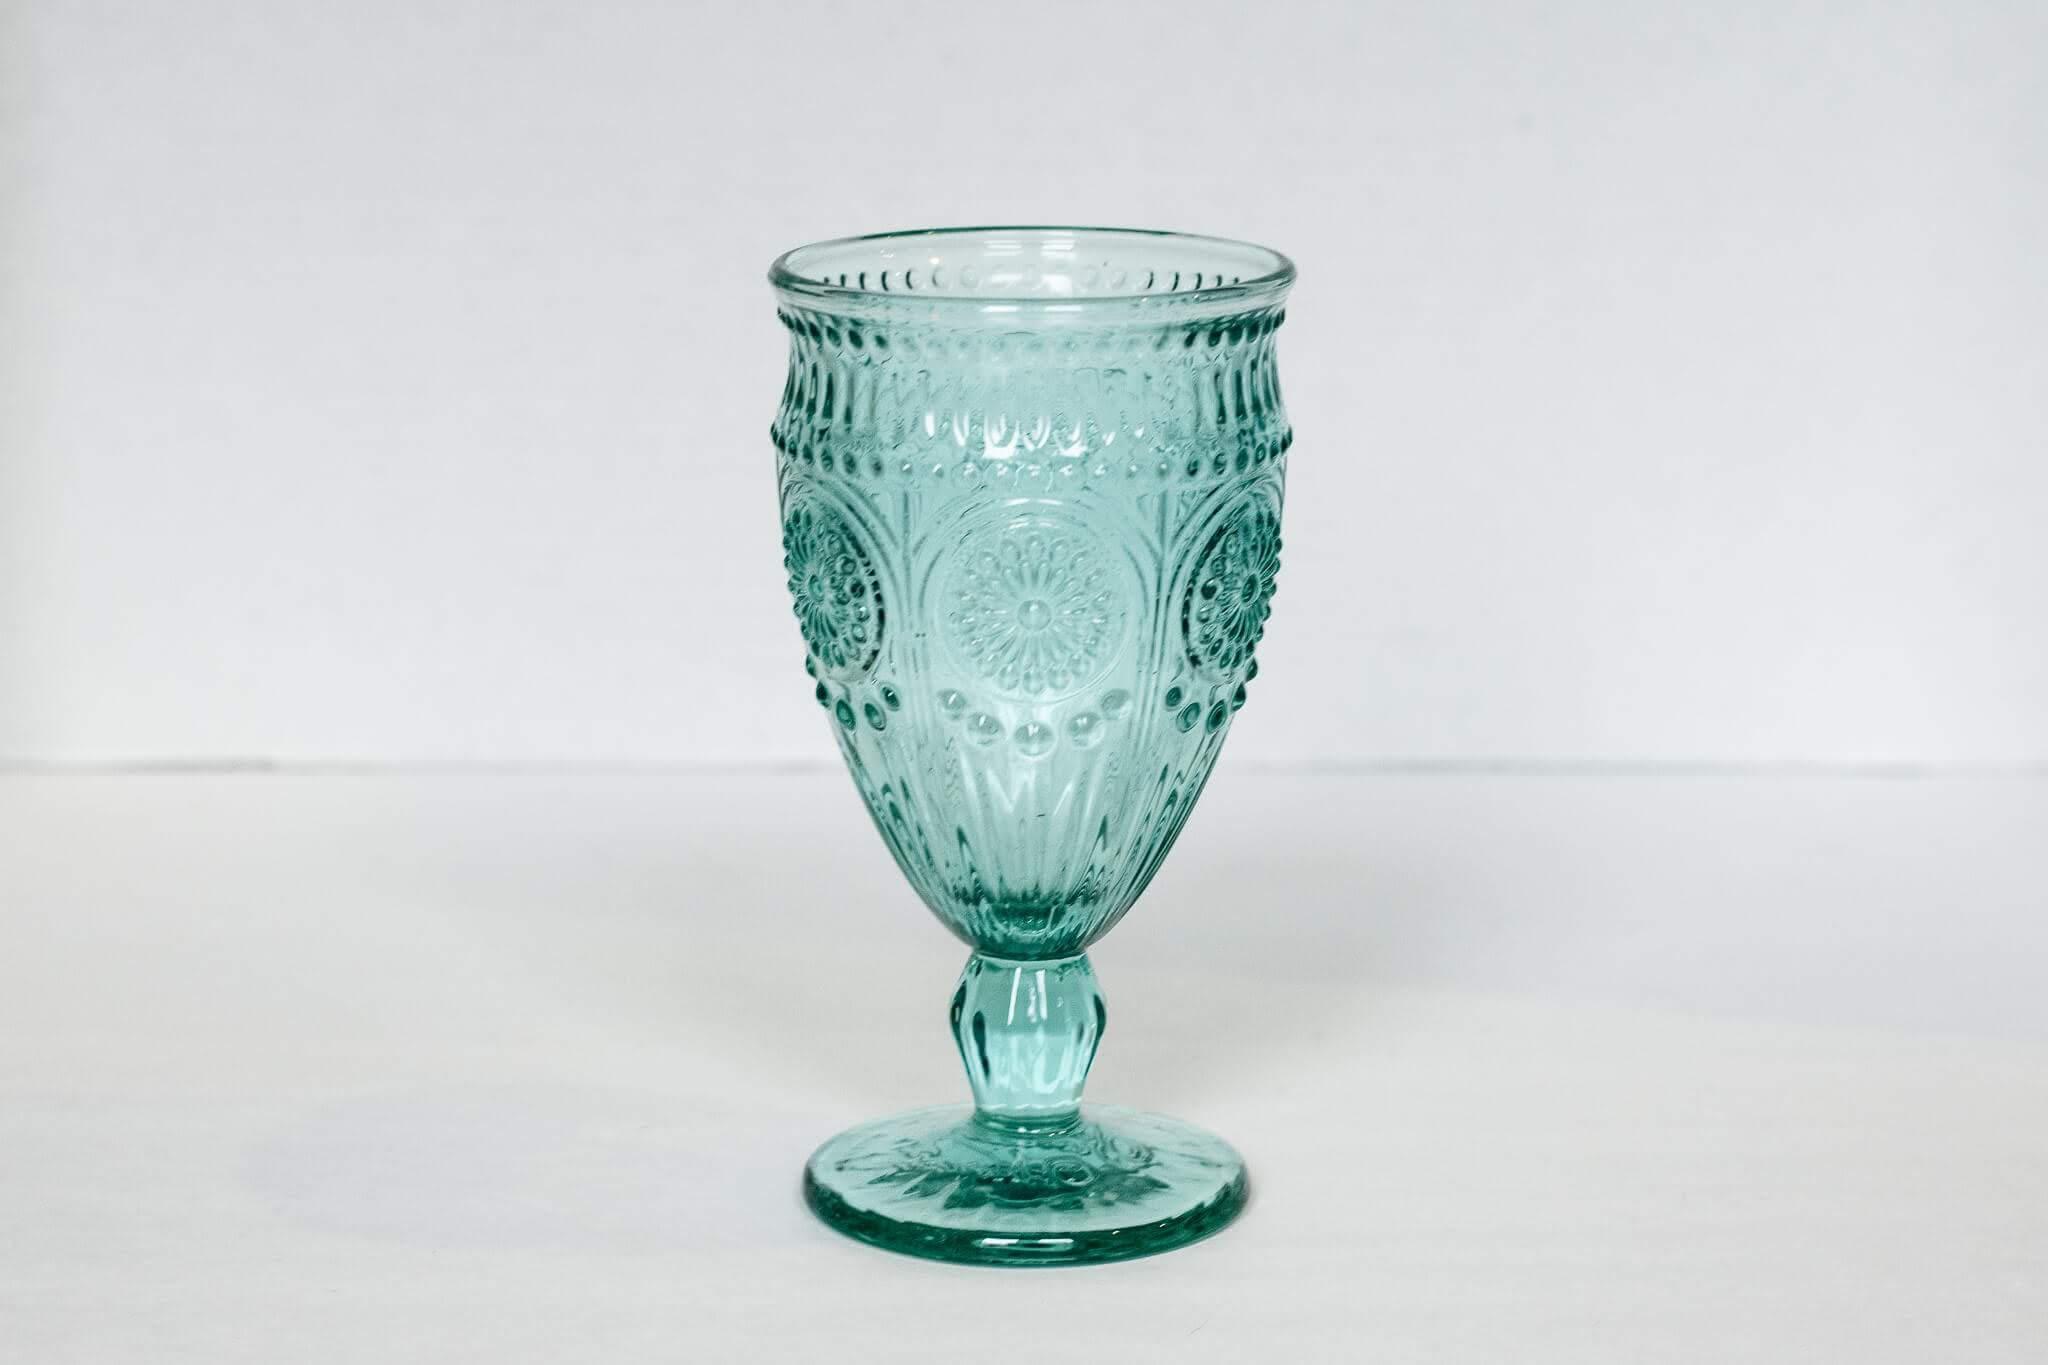 Glassware-7.jpg